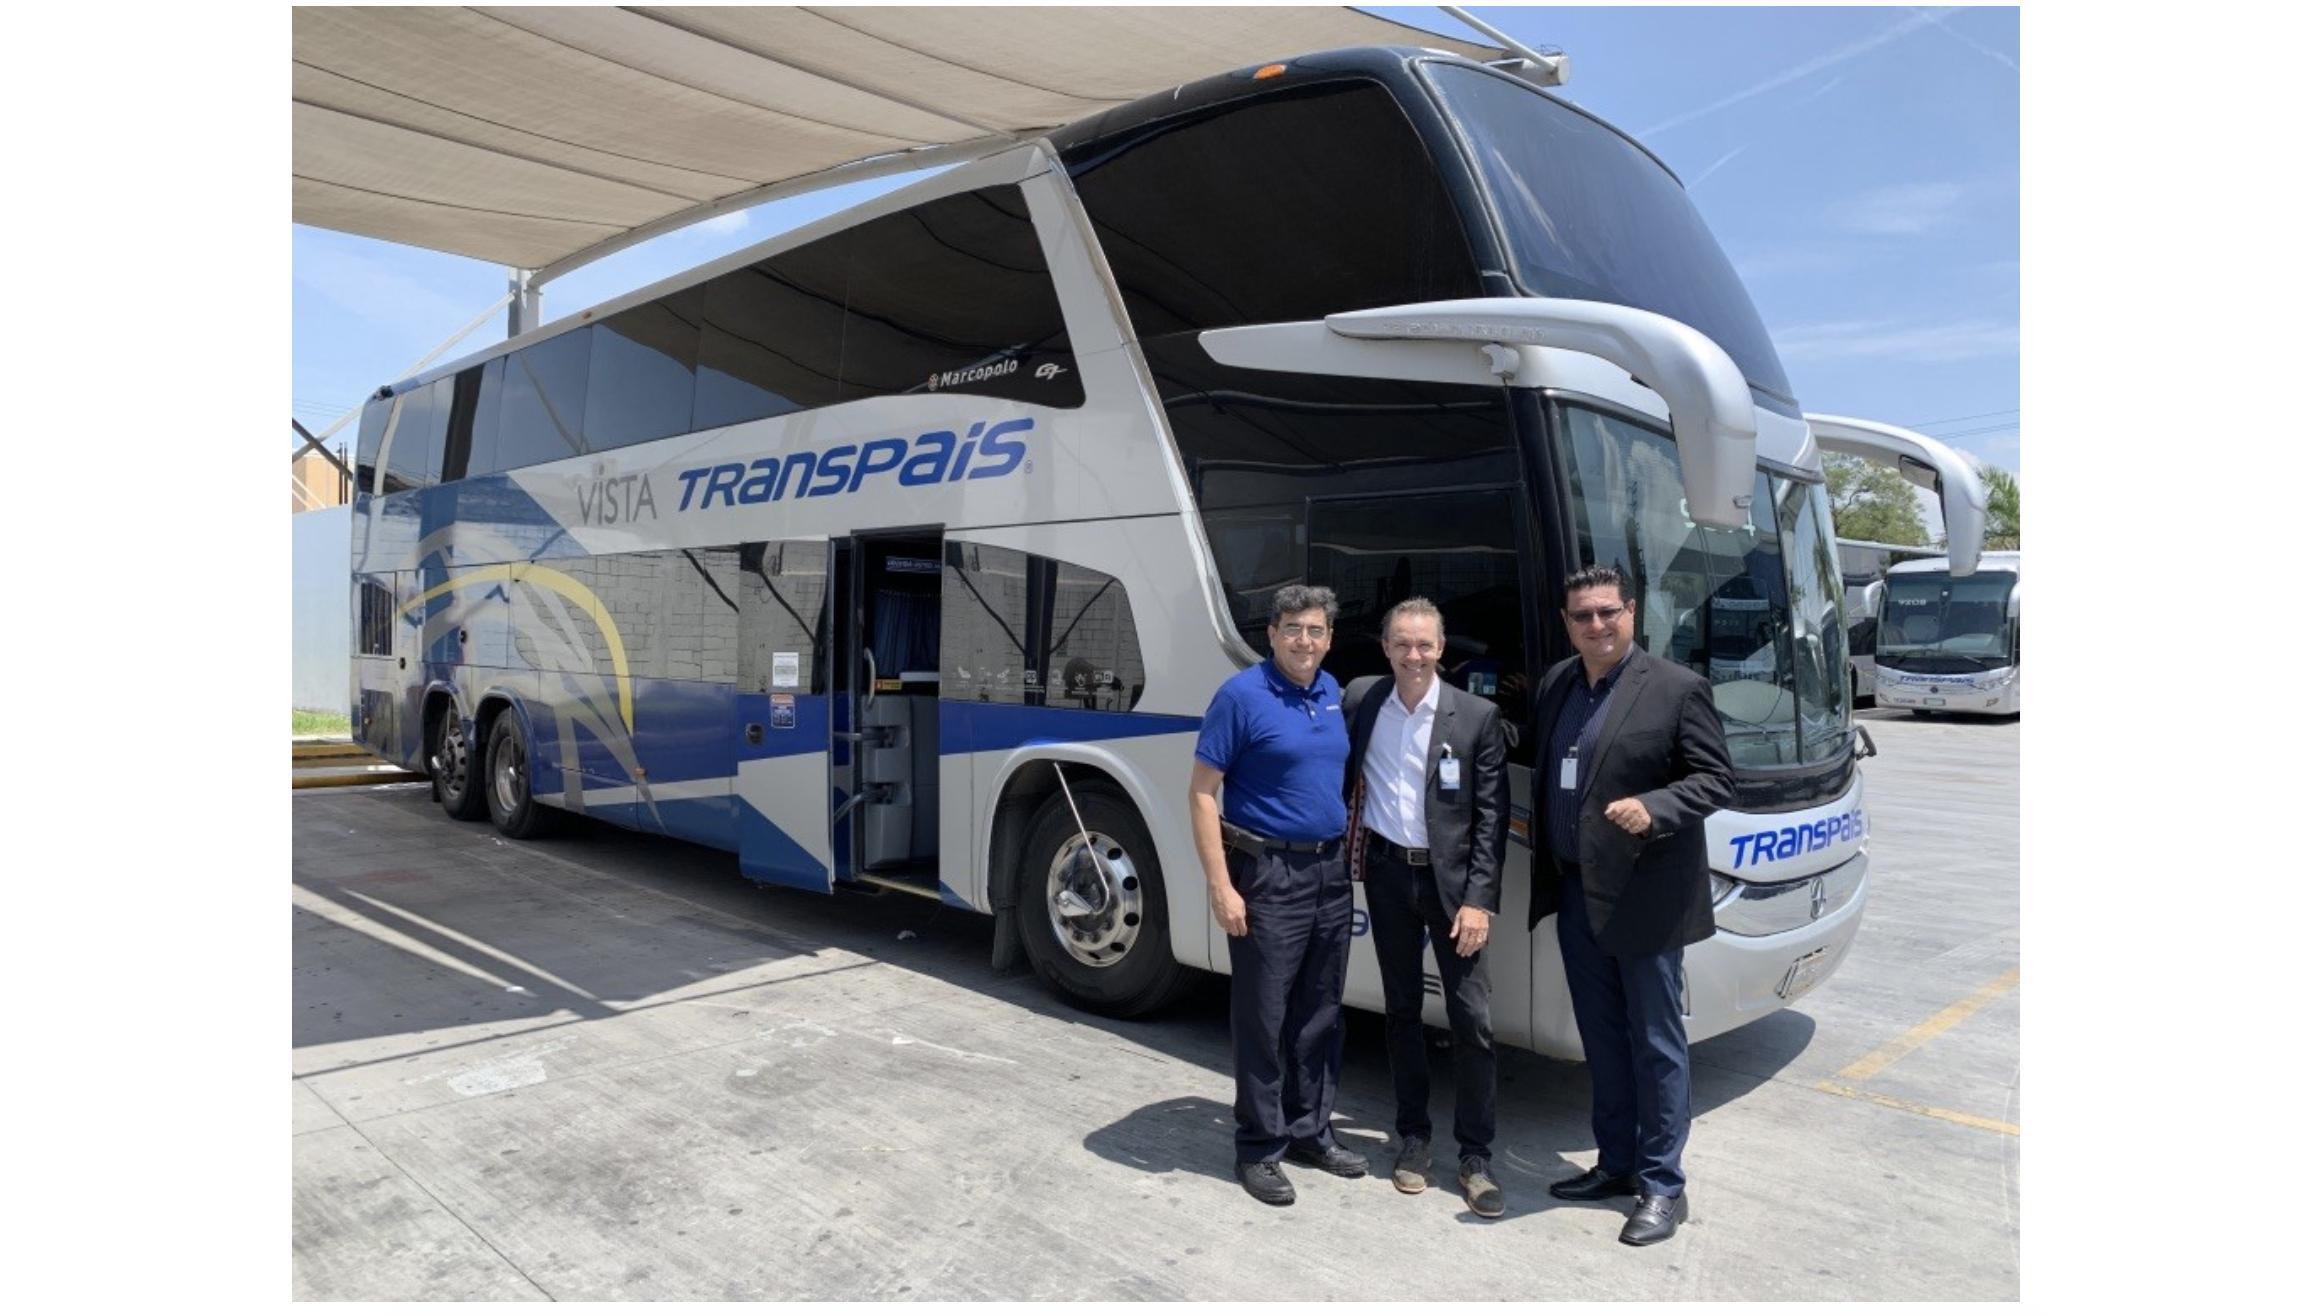 VANTIQ CMO Blaine Mathieu in front of high tech luxyury Transpais bus